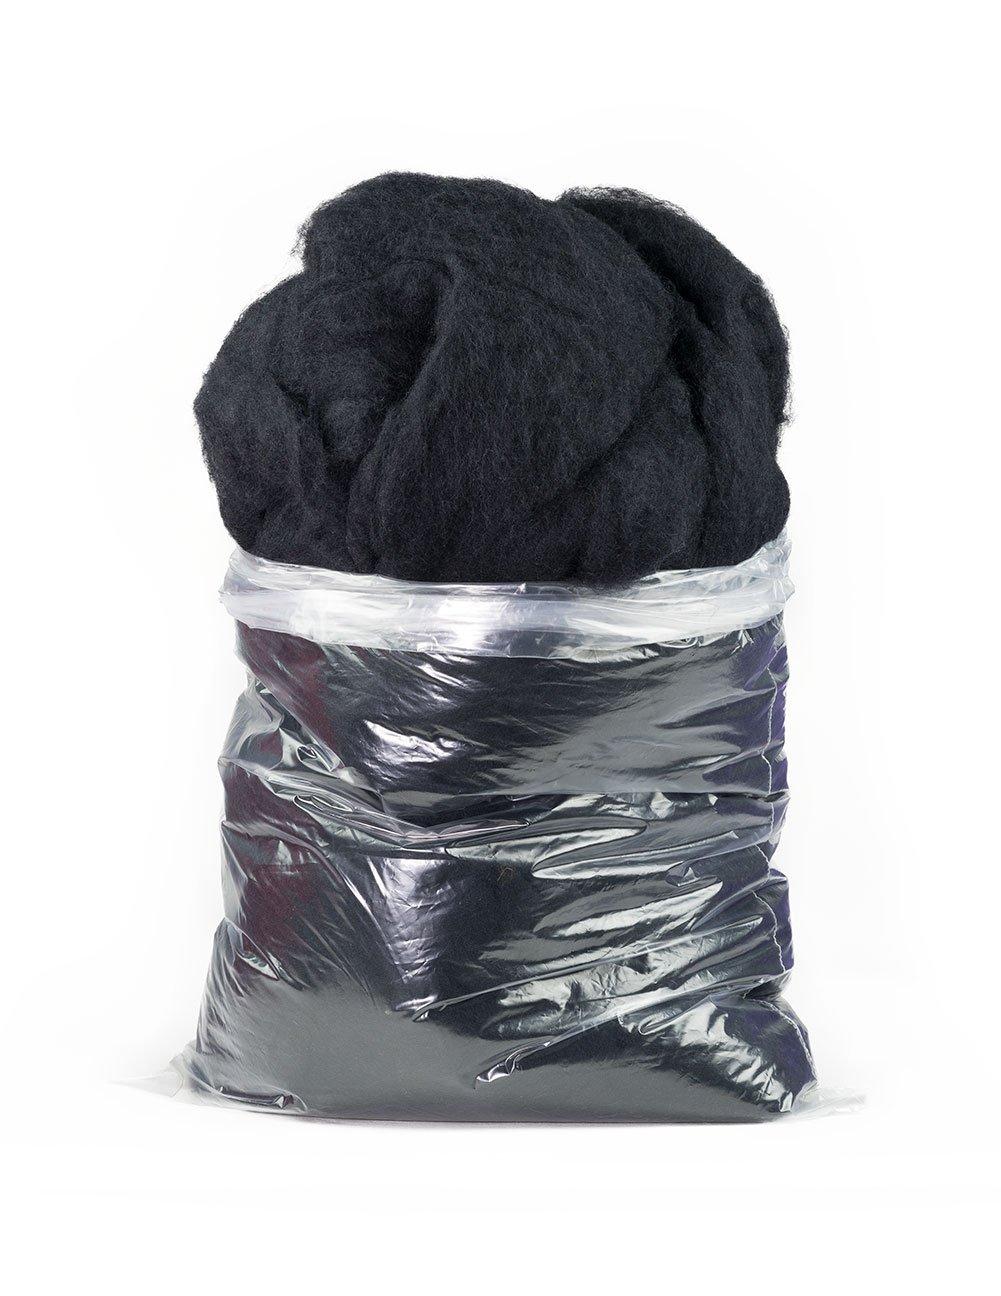 Carded Carbonized Felting Wool: 1 lb Bag, Black